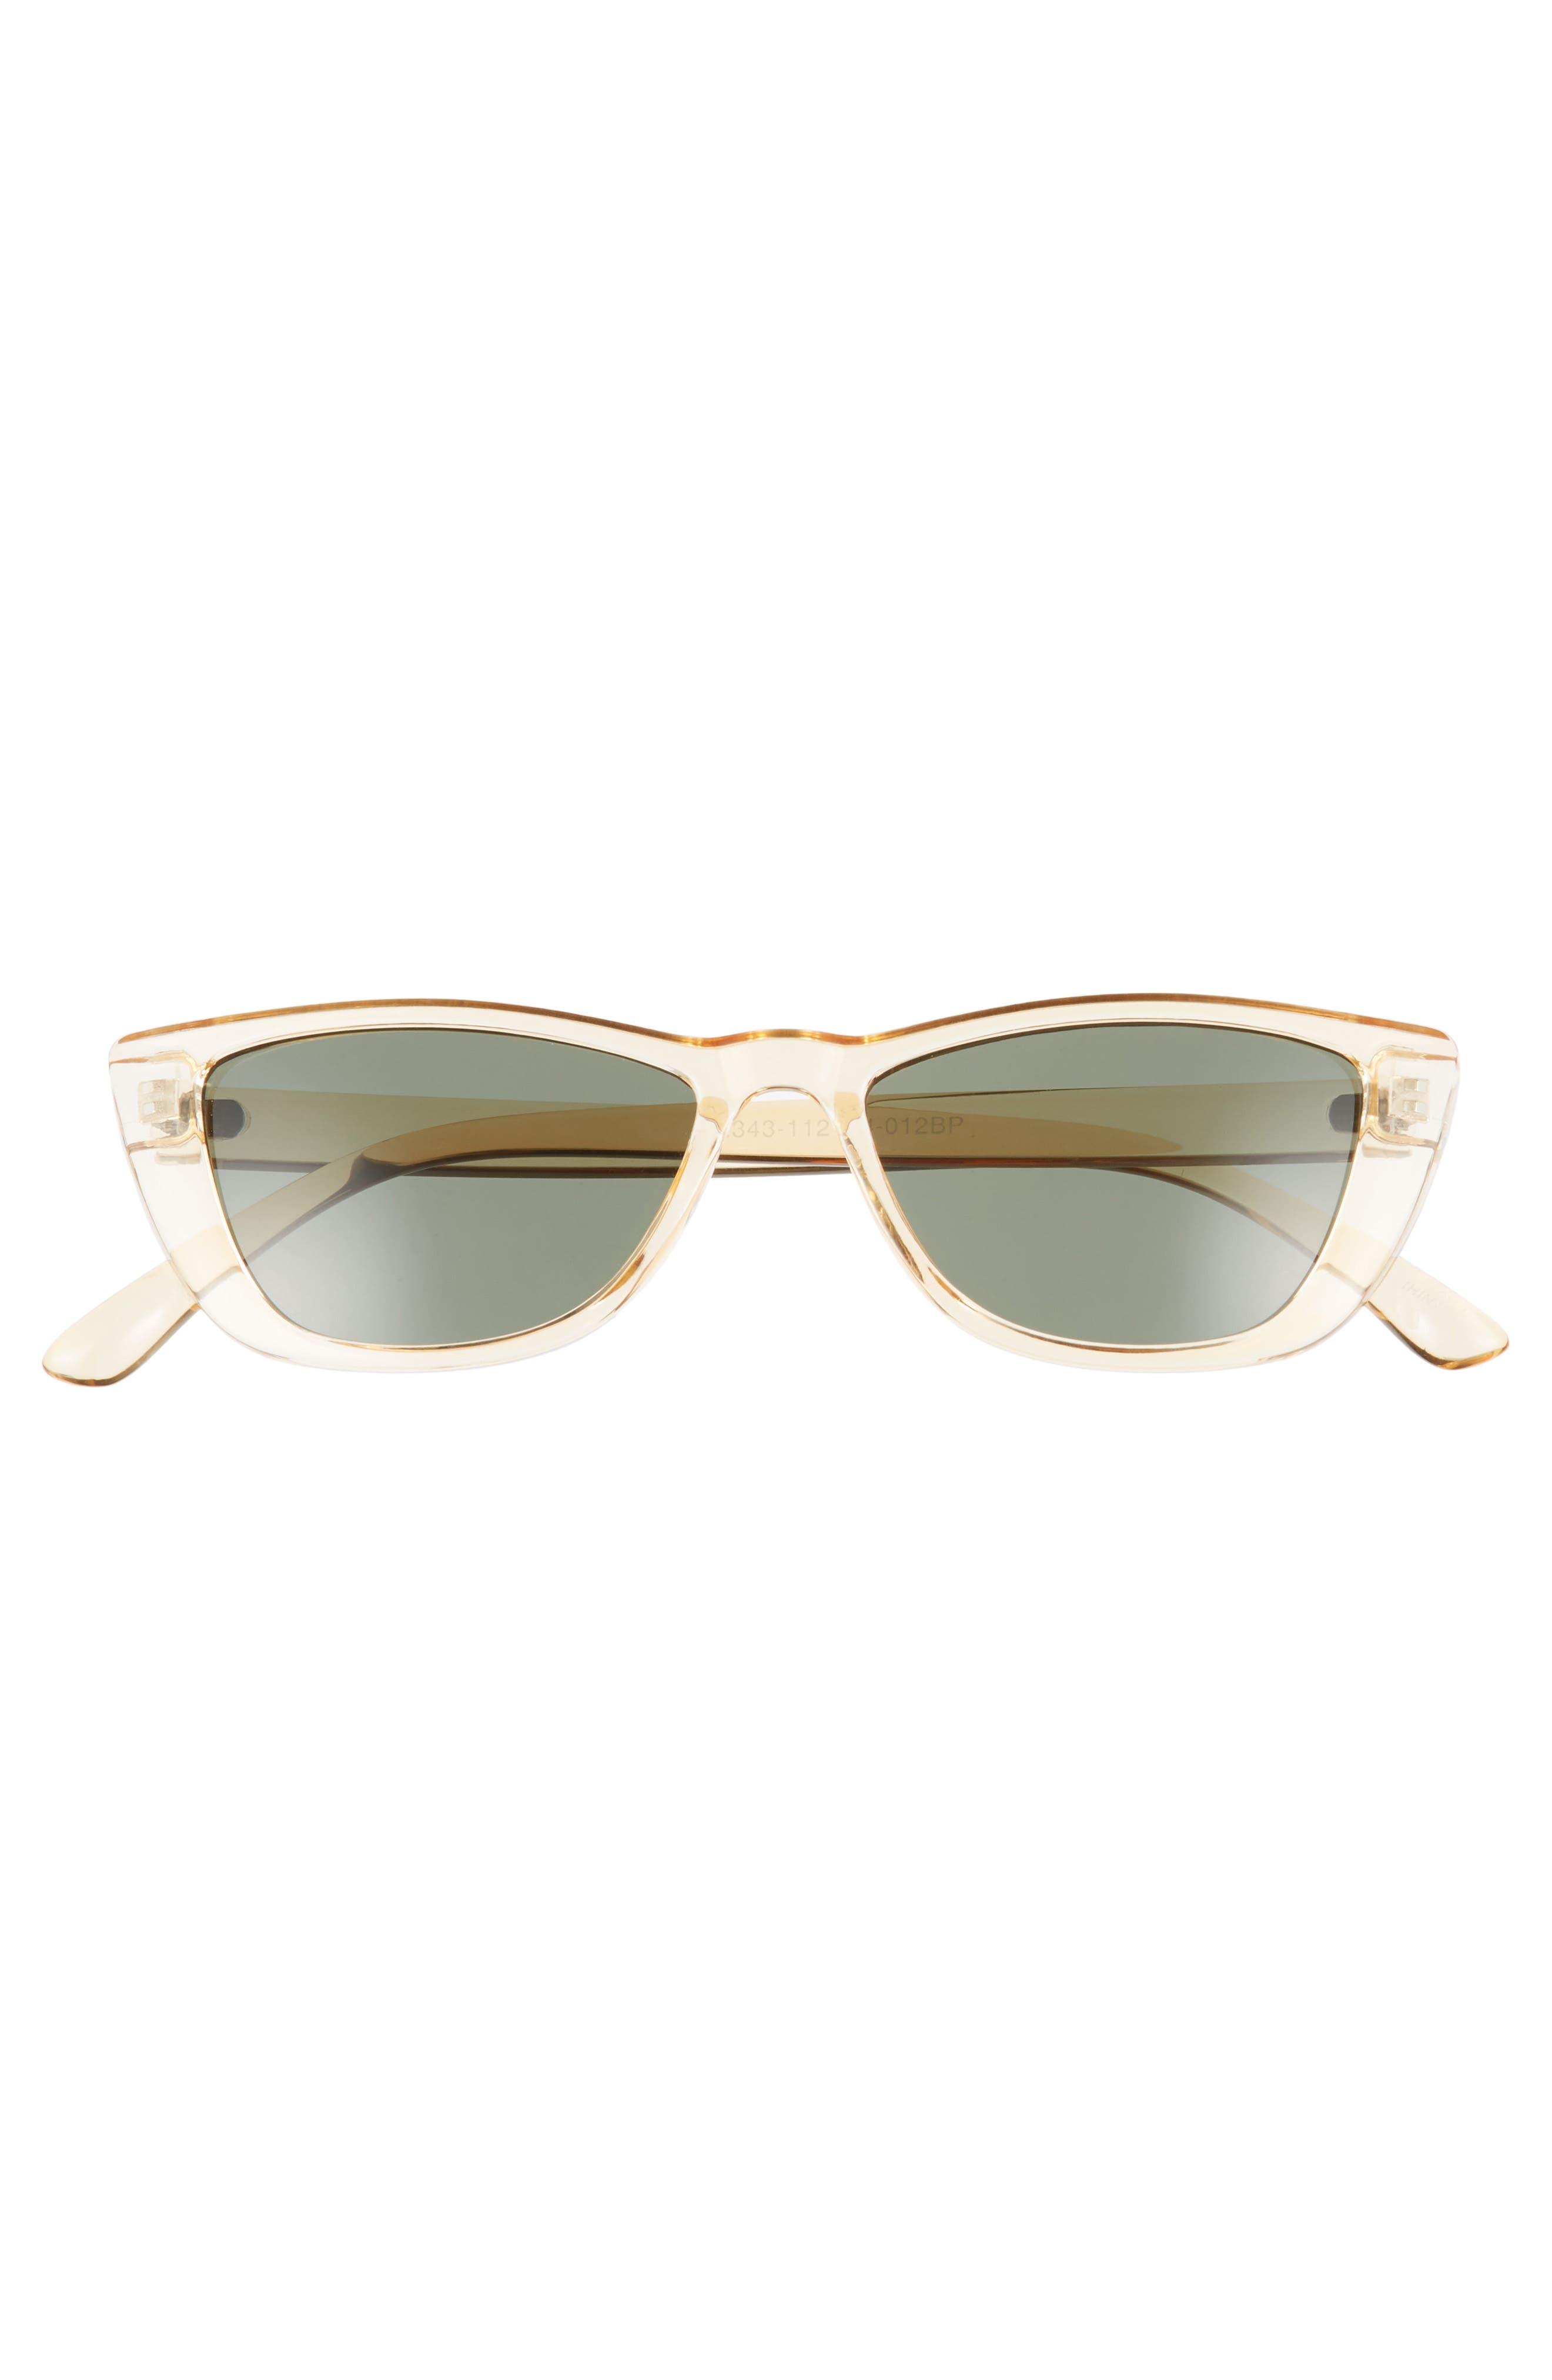 49mm Flat Top Rectangular Sunglasses,                             Alternate thumbnail 3, color,                             700